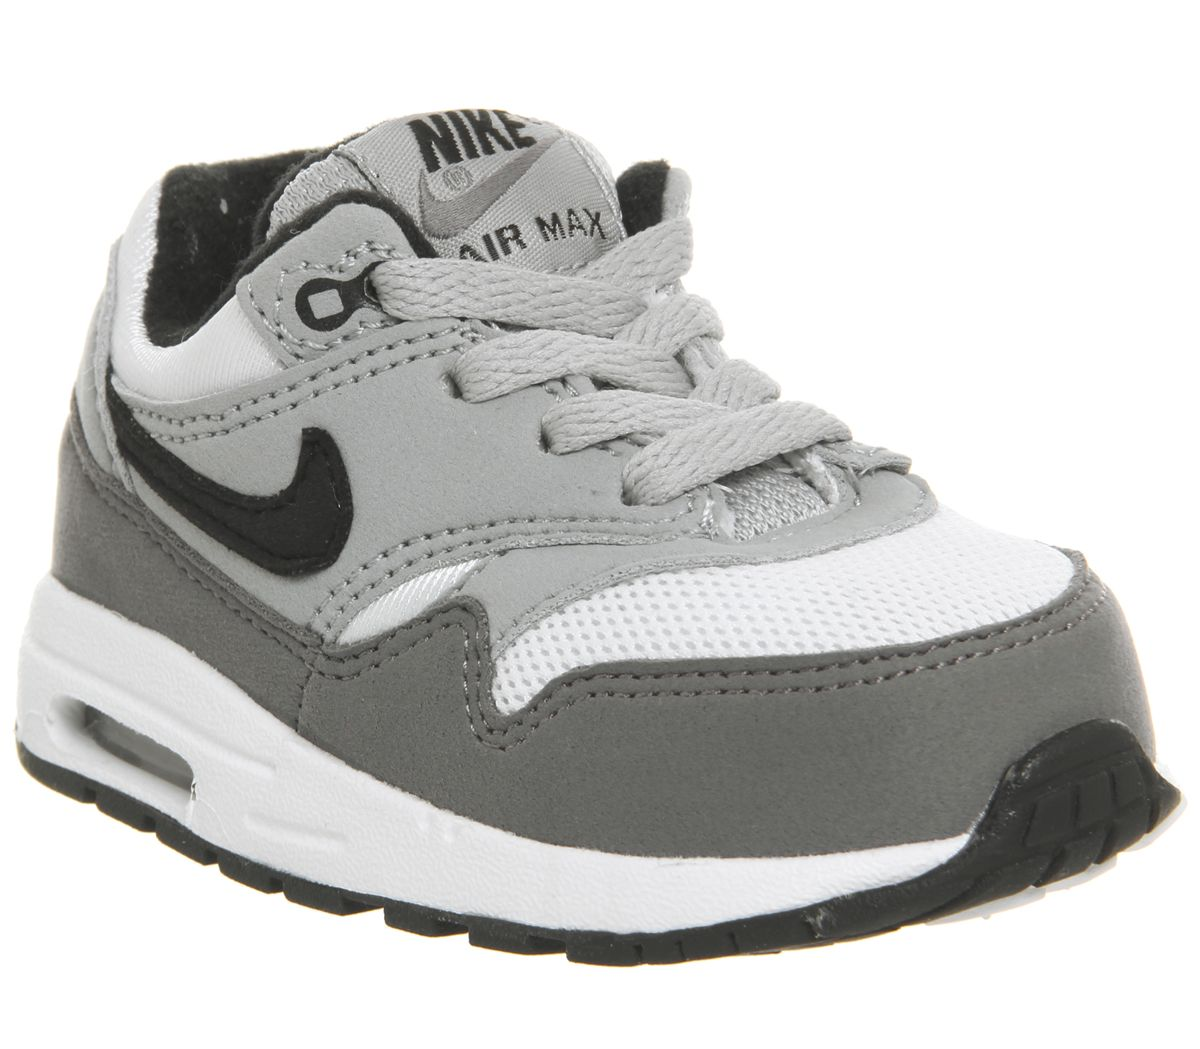 info for 533de 5cfae Nike Air Max 1 Td White Black Wolf Grey Gunsmoke - Unisex